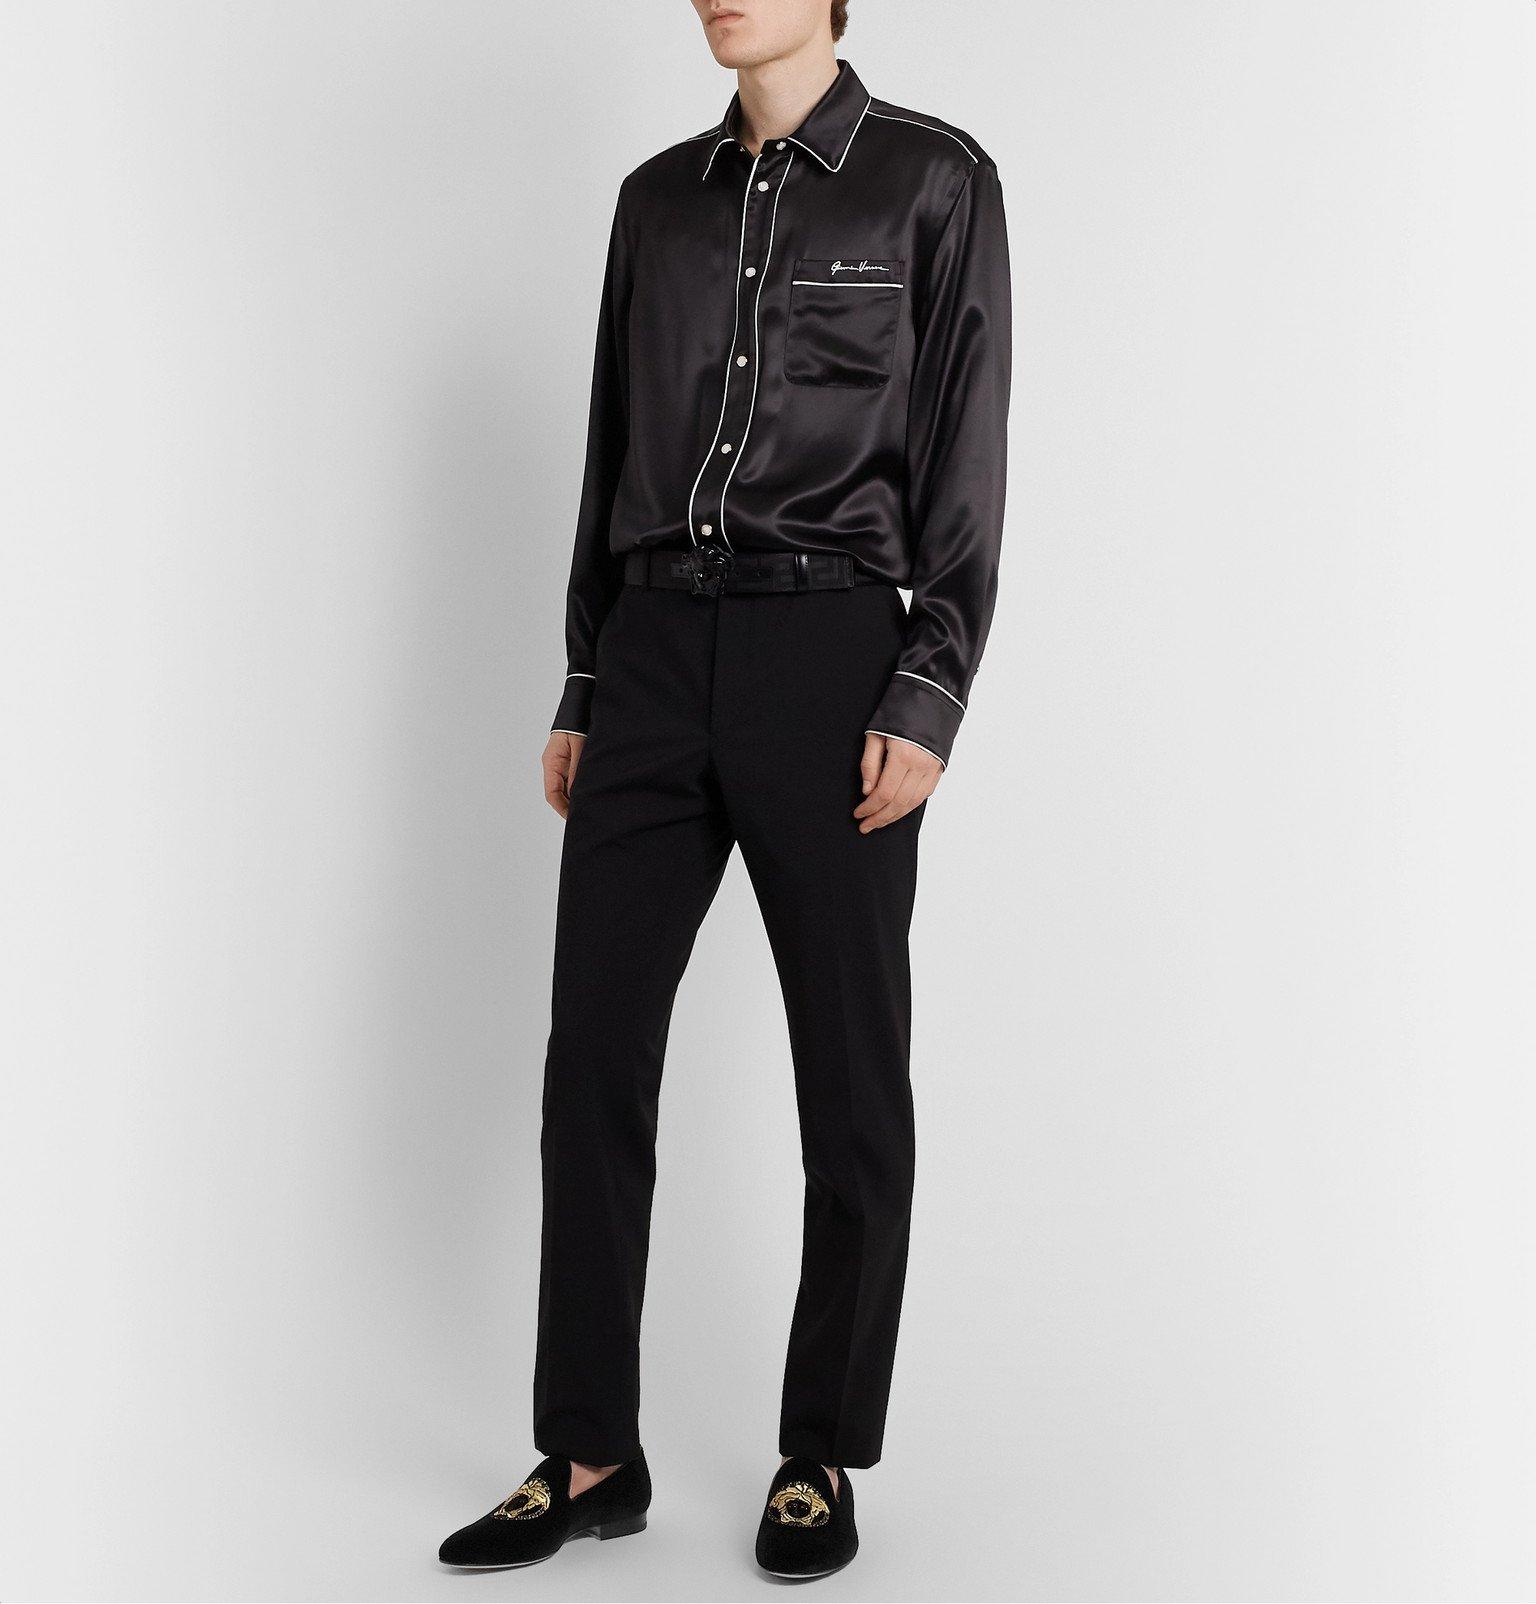 Versace - Logo-Embroidered Velvet Loafers - Black